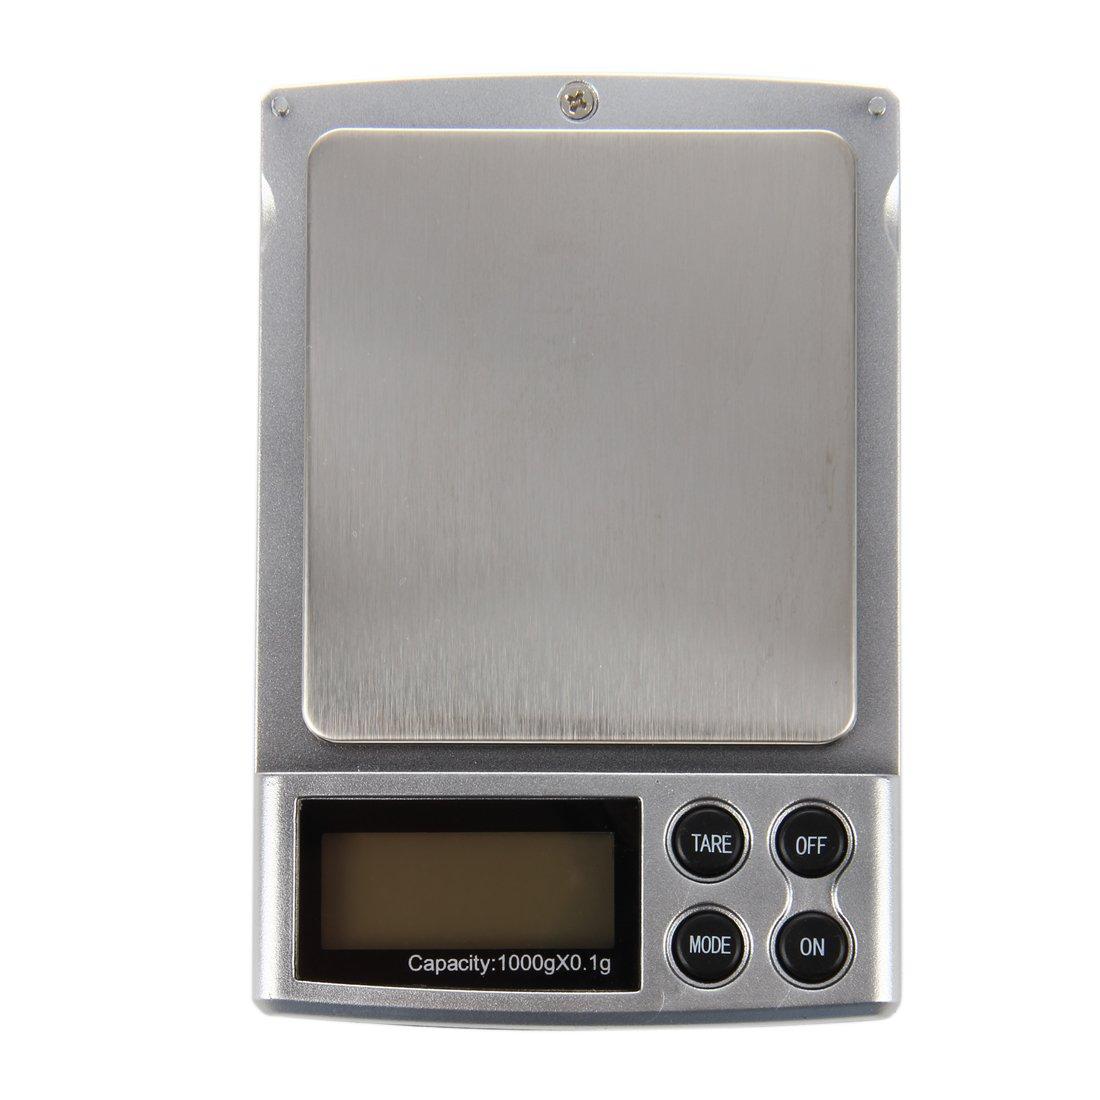 REFURBISHHOUSE 0.1-1000grams 0.1-1kg Mini Cocina Oficina Joyeria Electronica Digital Balanza Pesaje Bolso Escala